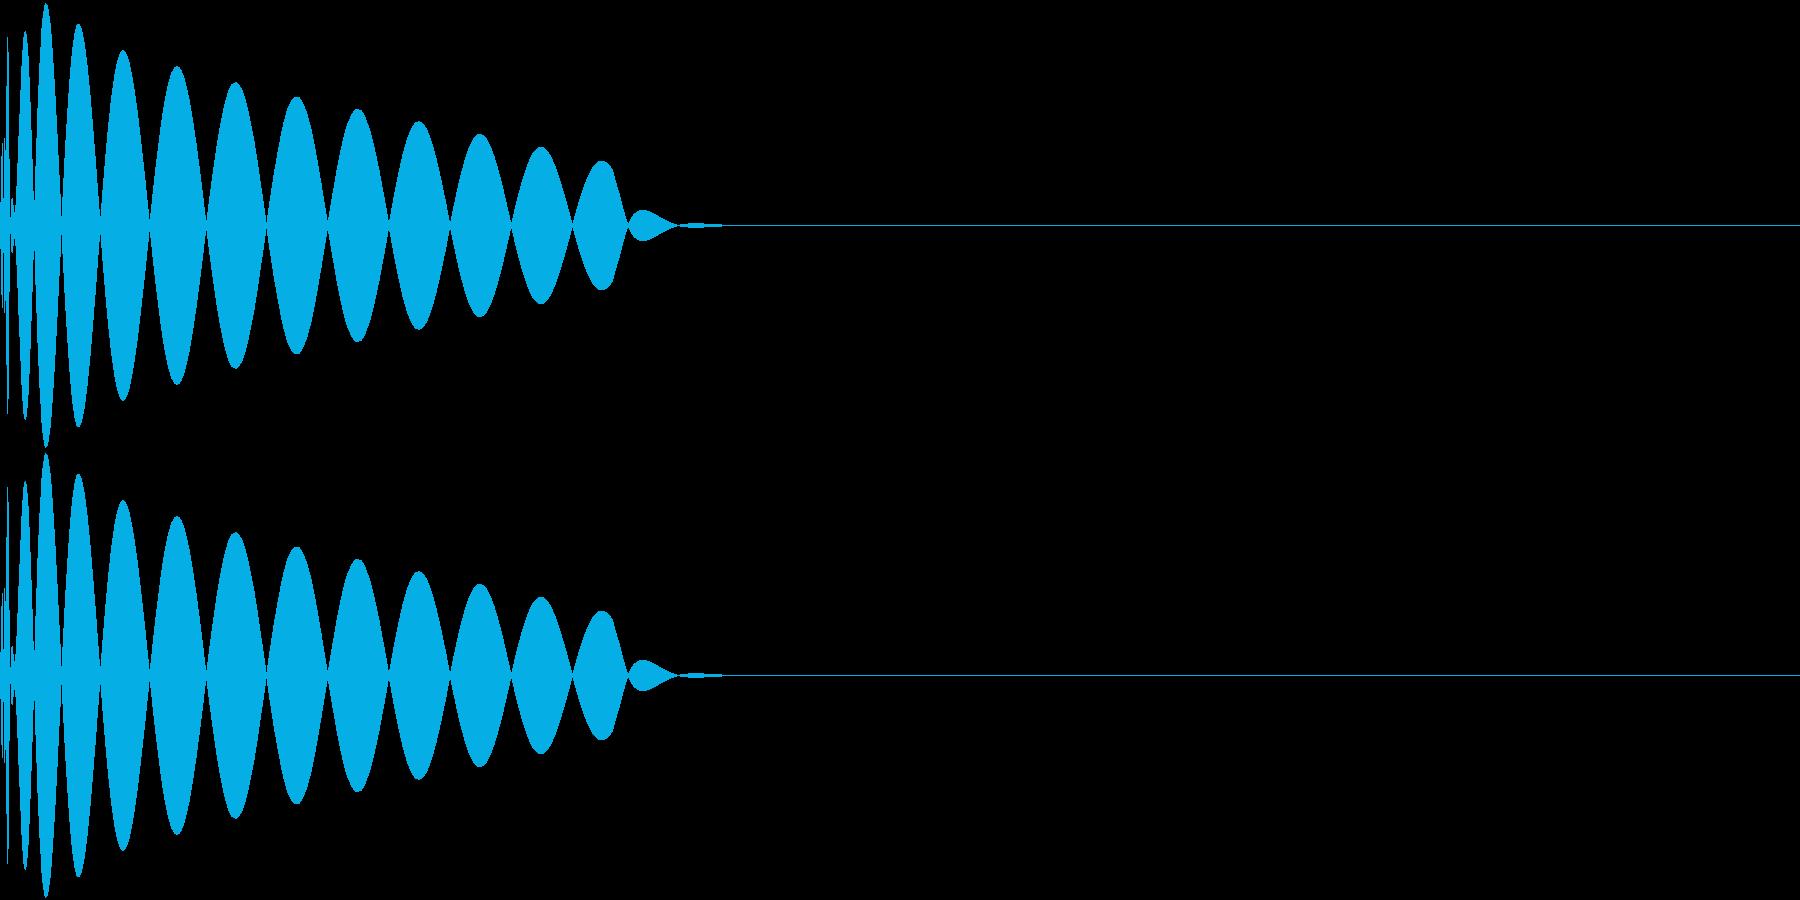 DTM Kick 37 オリジナル音源の再生済みの波形